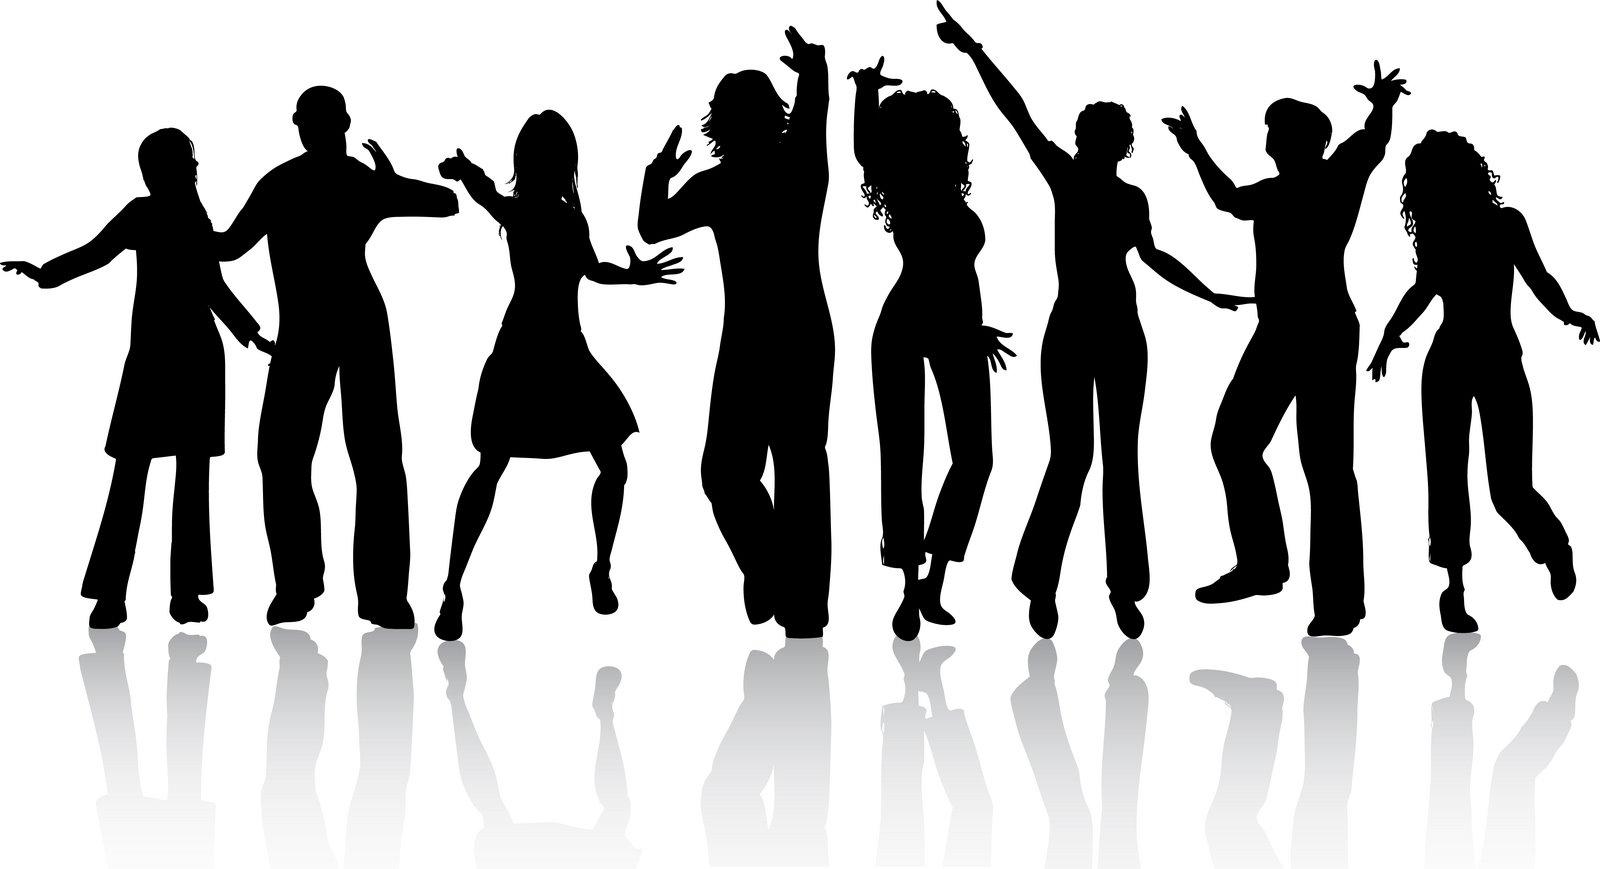 Contemporary Dance Class Clipart